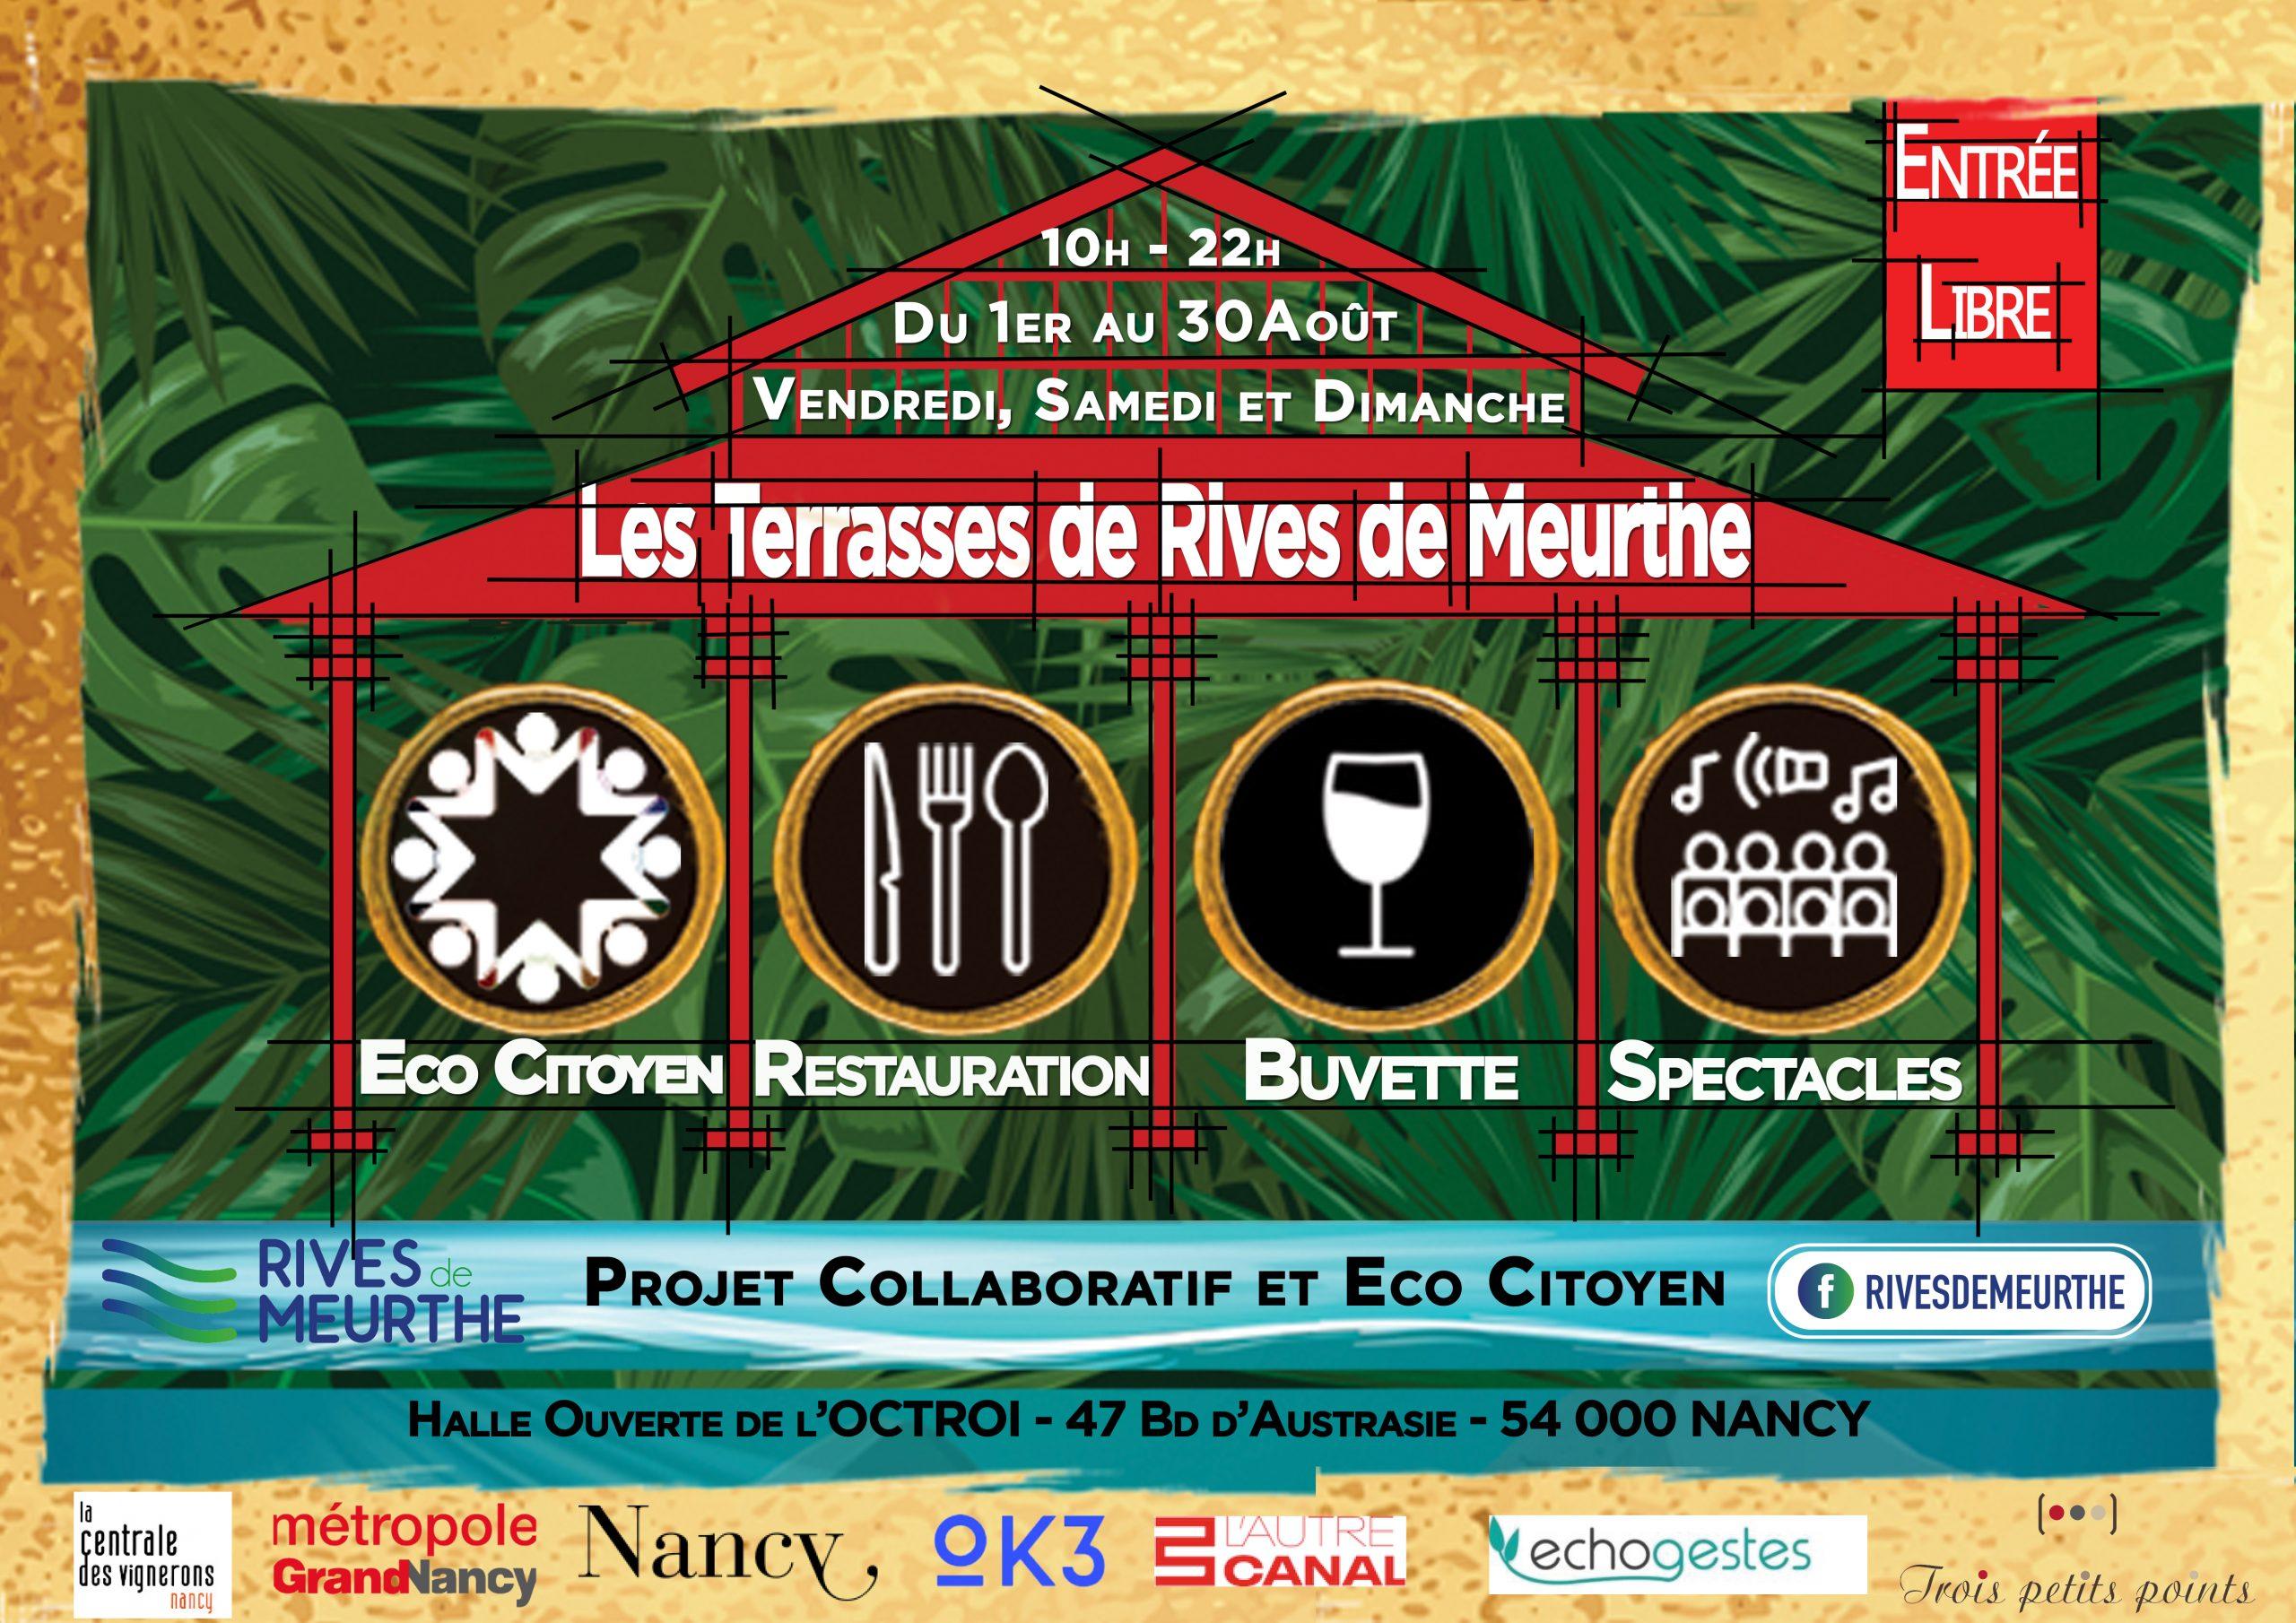 Les Terrasses de Rives de Meurthe… dernier week-end !